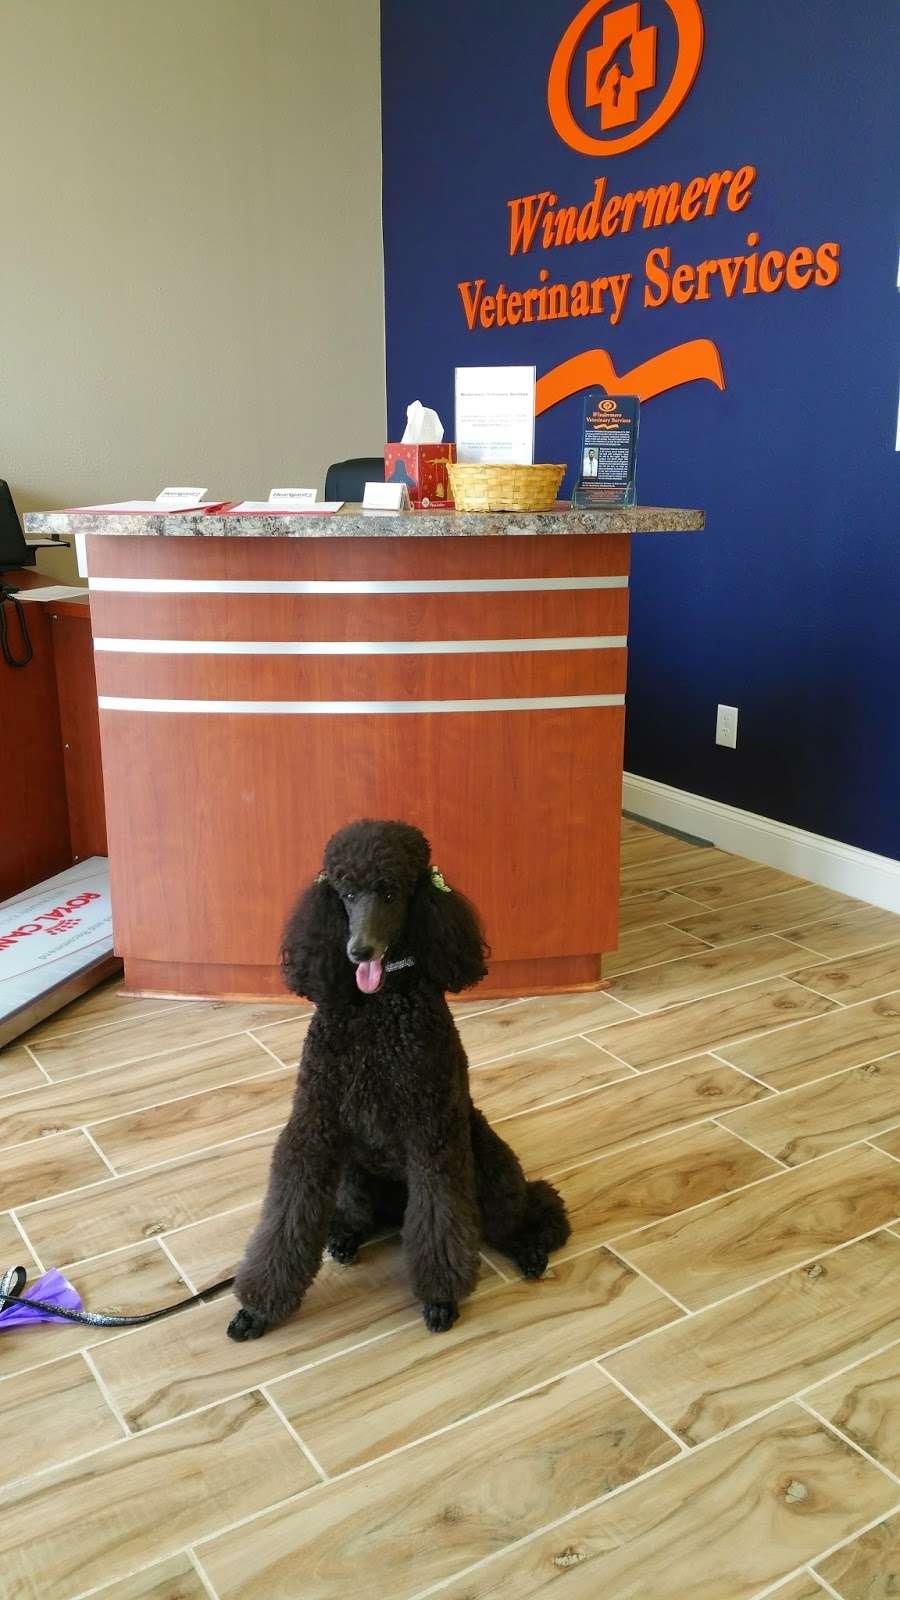 Windermere Veterinary Services - veterinary care    Photo 6 of 10   Address: 7315 Winter Garden Vineland Rd #109, Windermere, FL 34786, USA   Phone: (407) 217-7635